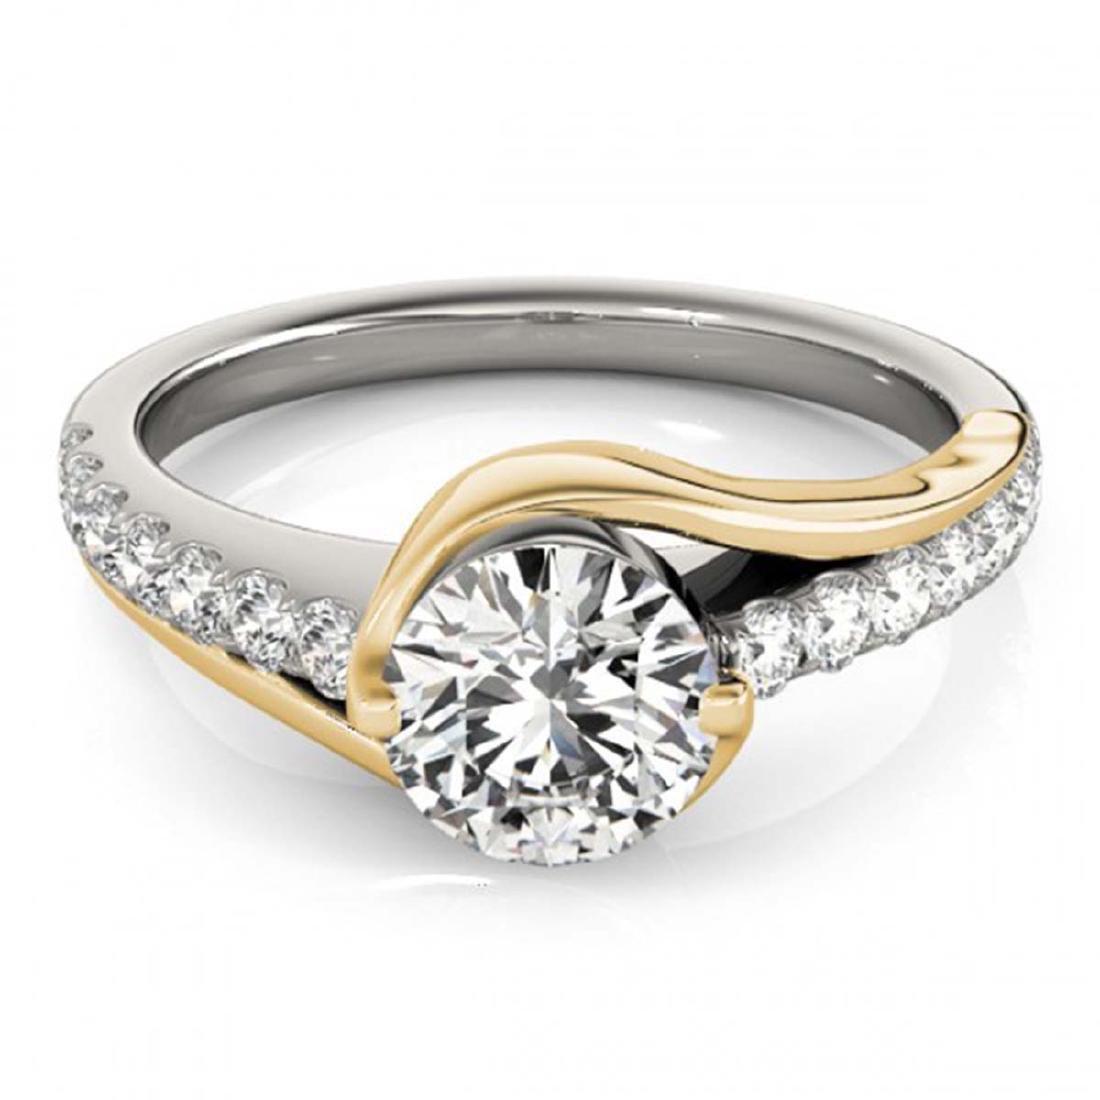 1.25 ctw VS/SI Diamond Solitaire Ring 14K White & - 2